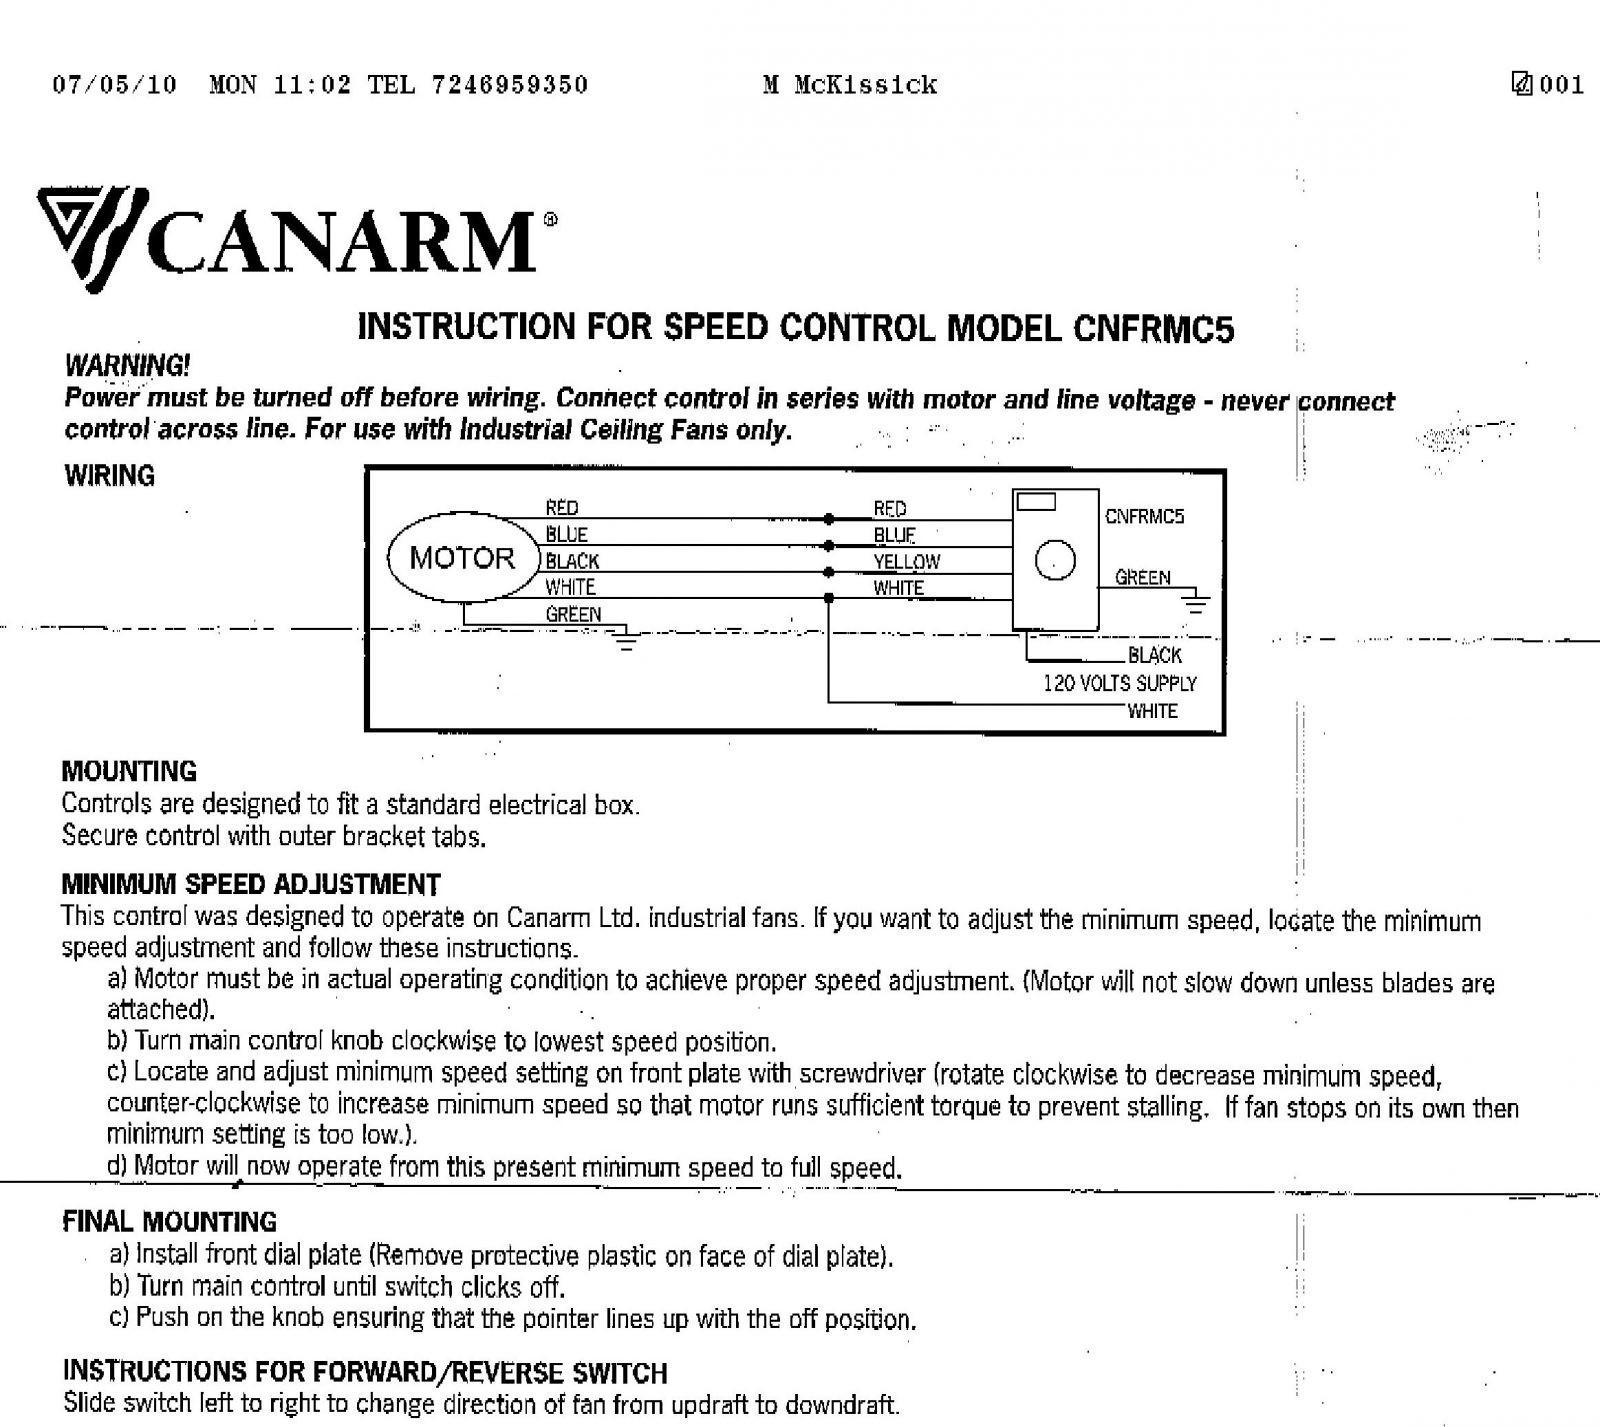 Wiring Diagram For Canarm Exhaust Fan Fresh Industrial Exhaust Fan Wiring Diagram Best Unique Light And Fan